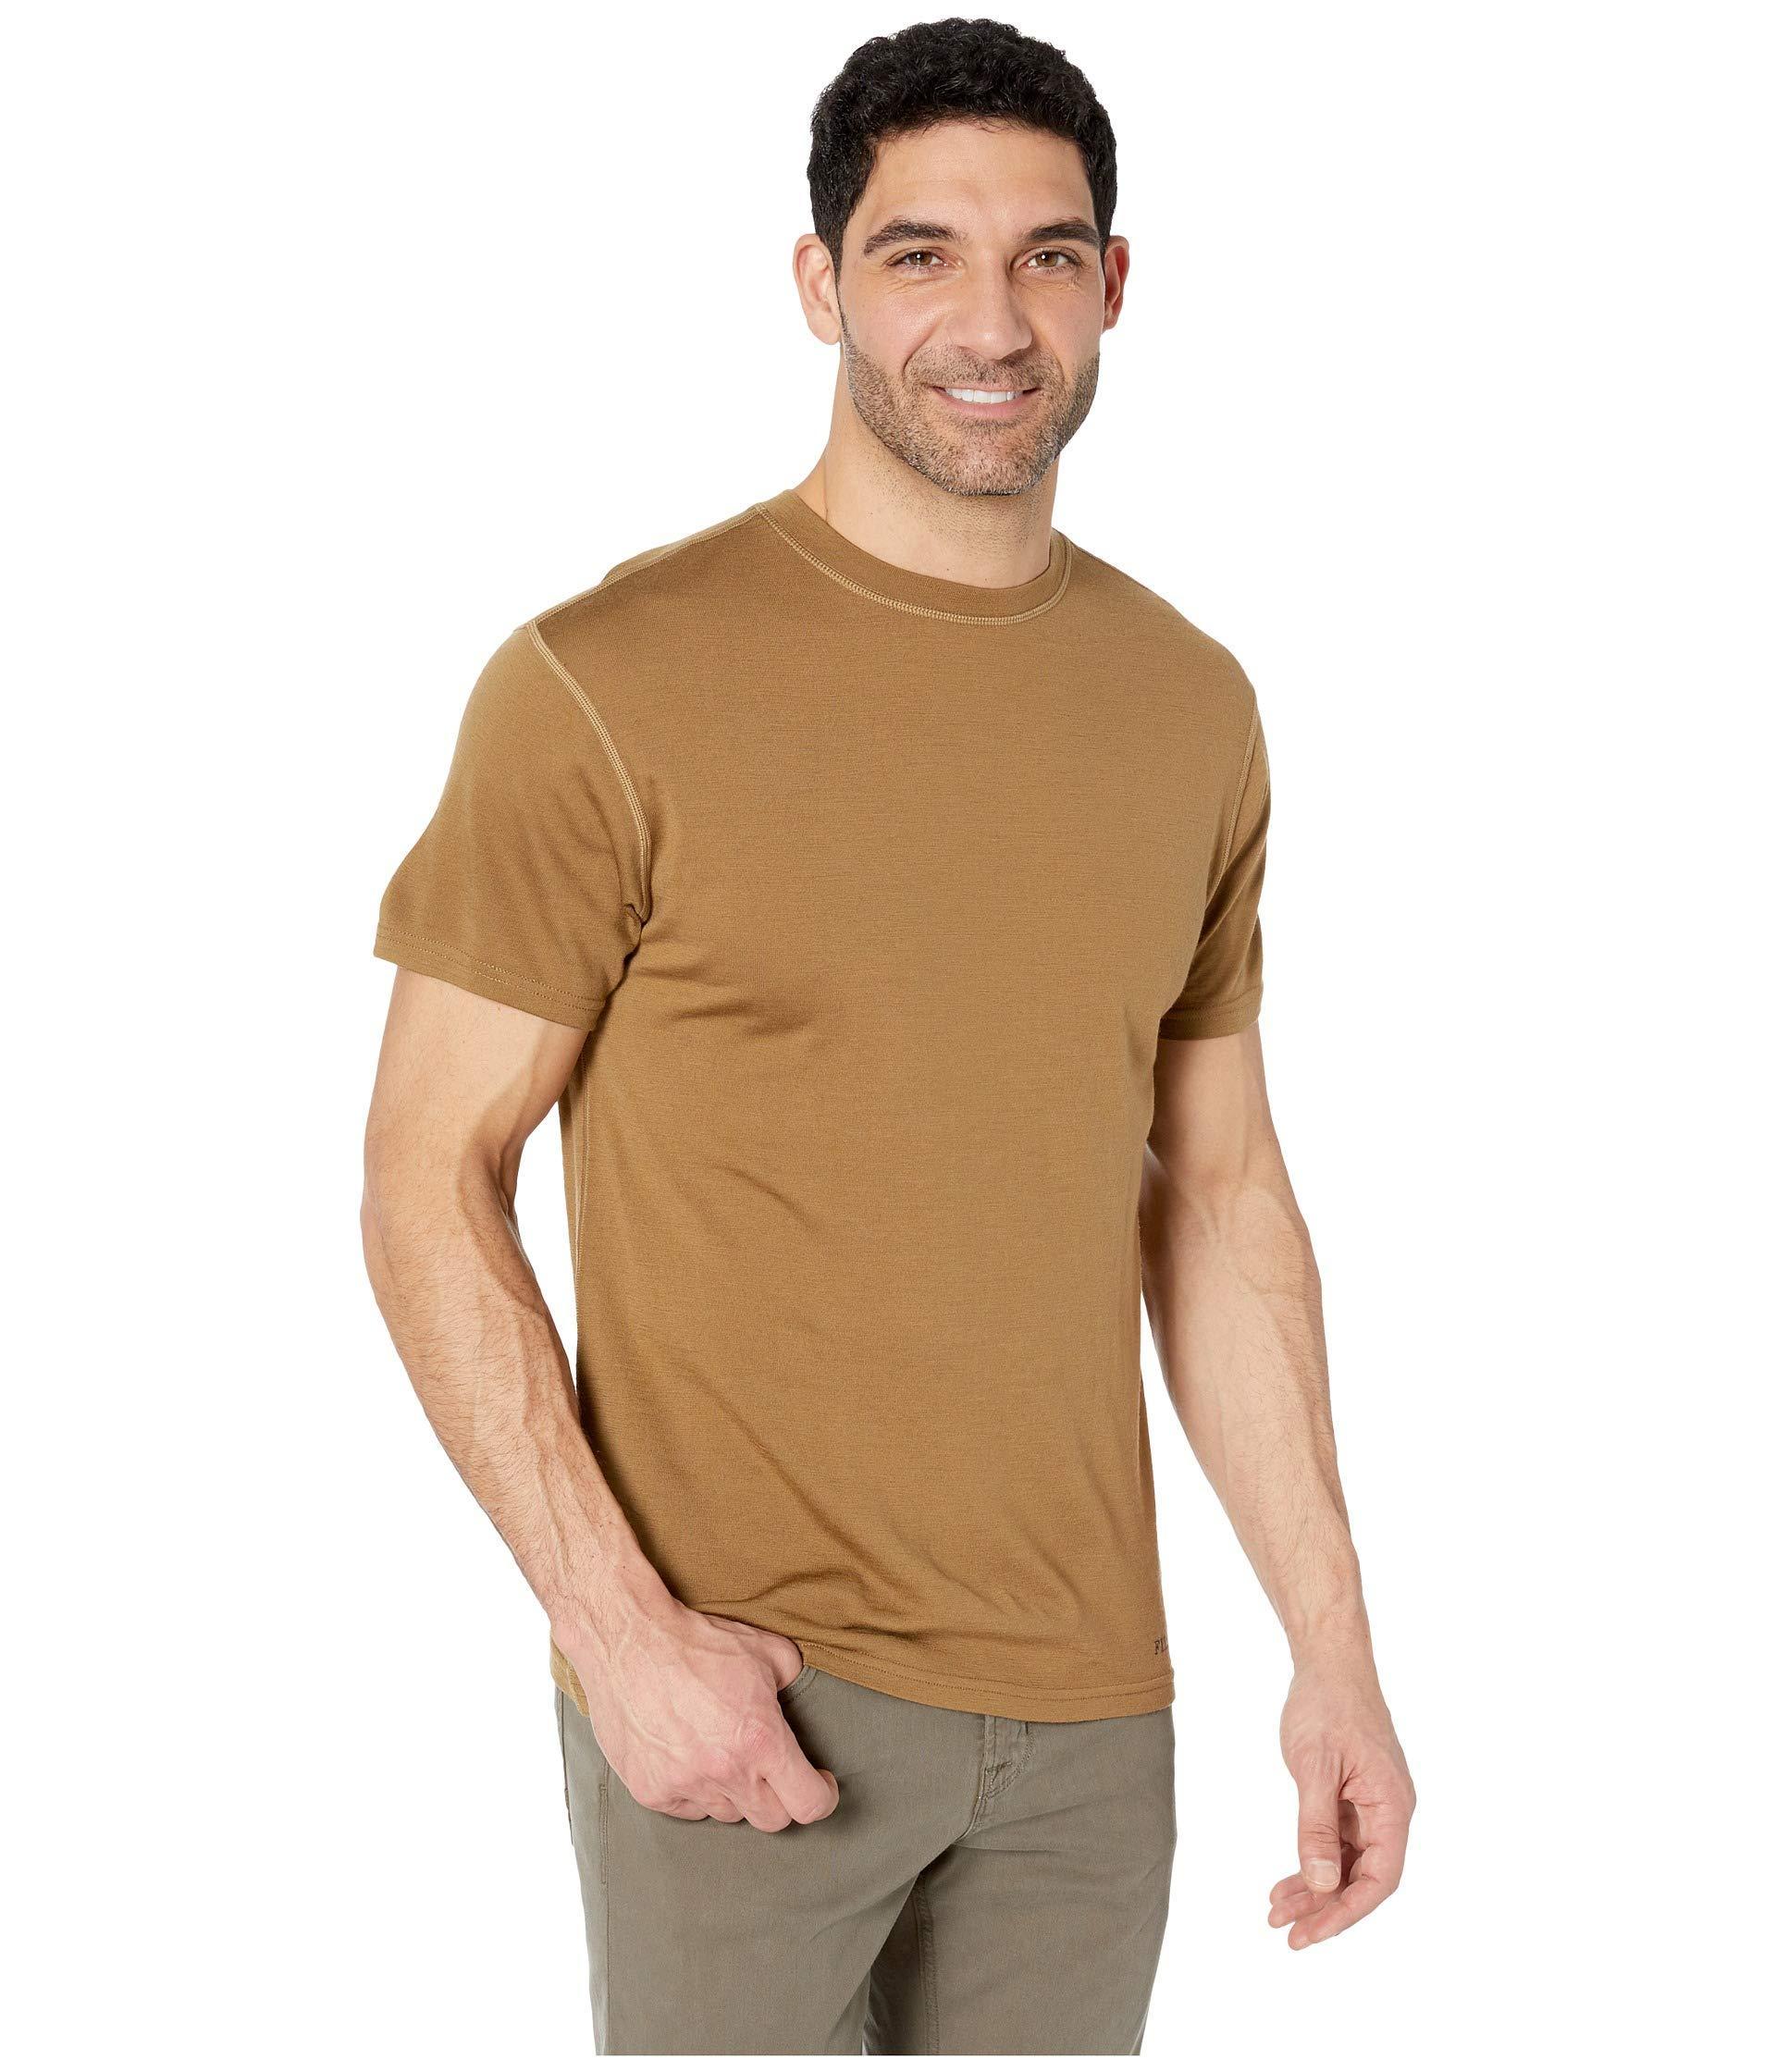 0a0da3d2 ... 210g Merino Short Sleeve Crew (Rugged Tan) Men's T Shirt for. View  fullscreen